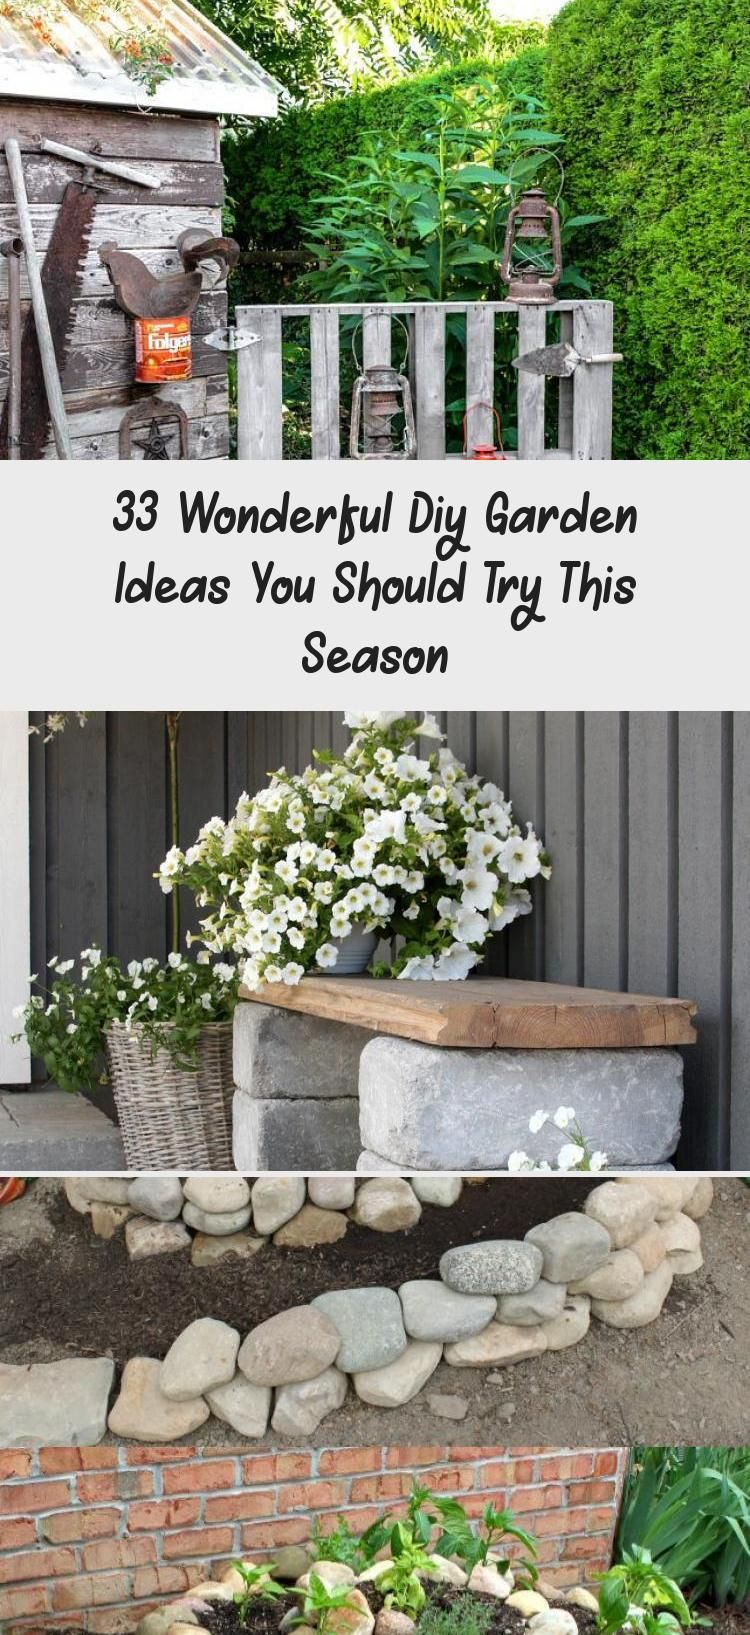 10 Small Rock Garden Design Ideas Elegant As Well As Lovely